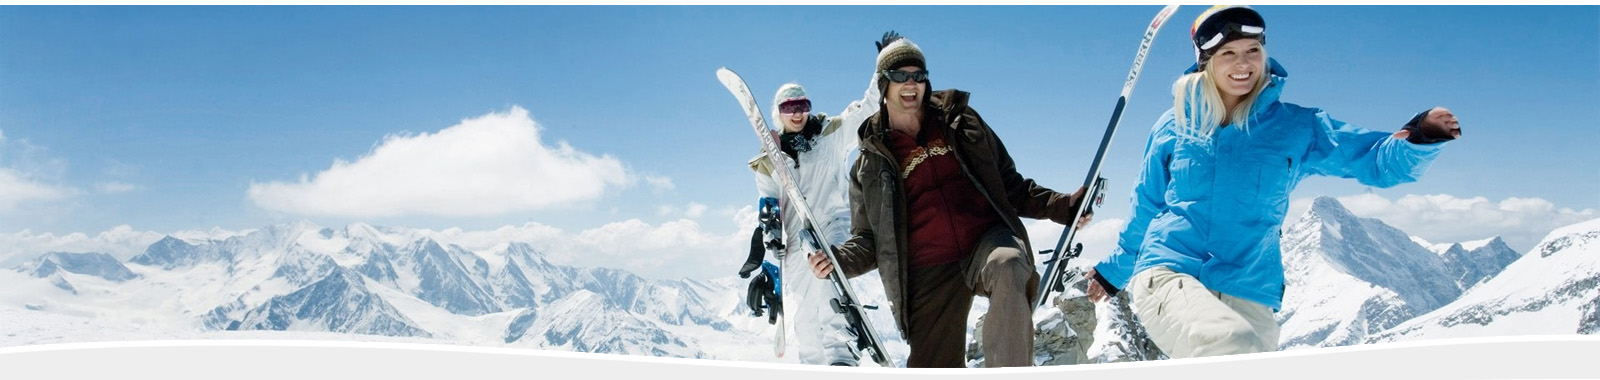 wintersportvakantie1